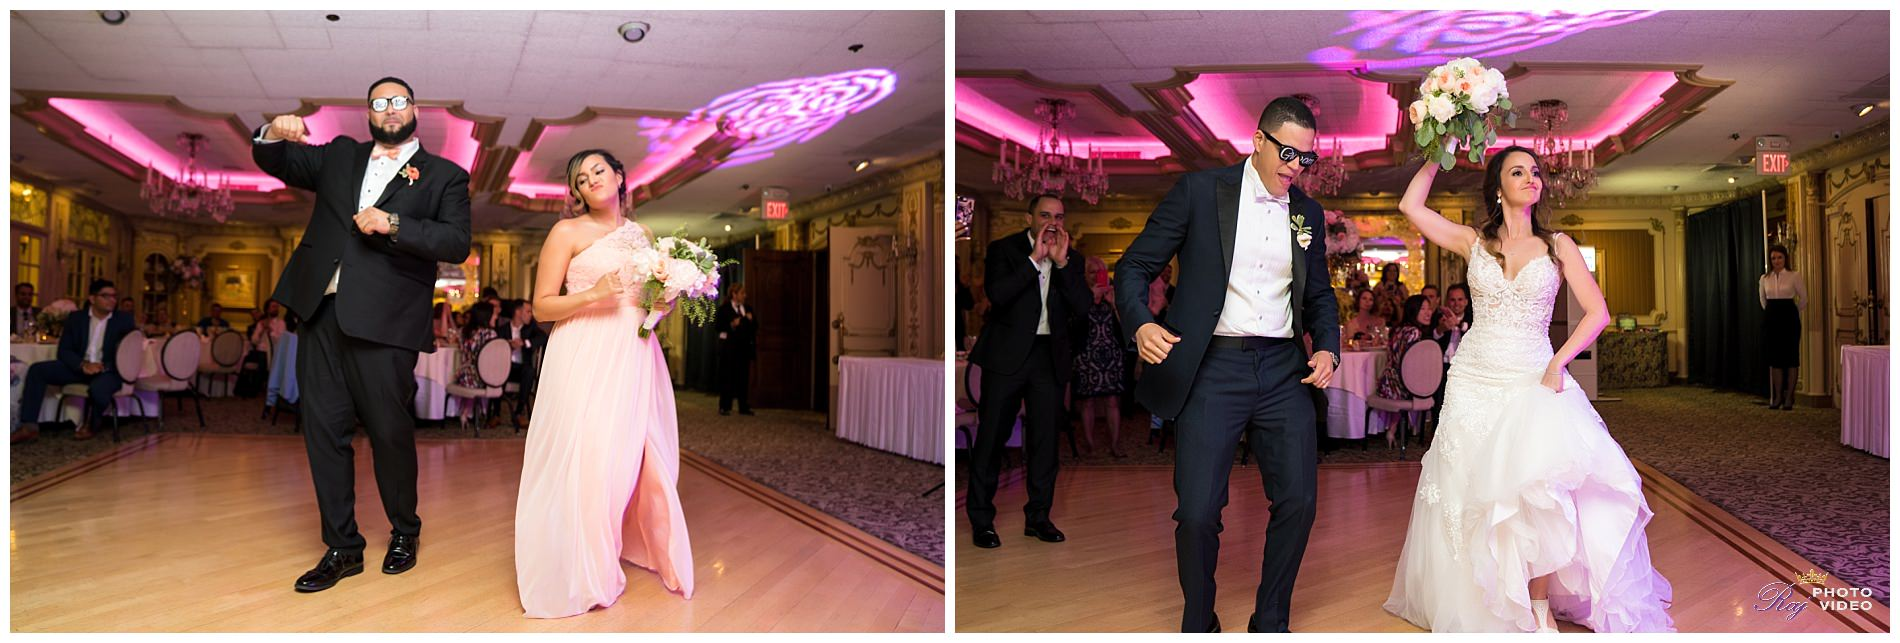 The-Manor-West-Orange-NJ-Wedding-Reception-Yanet-Jose-16.jpg